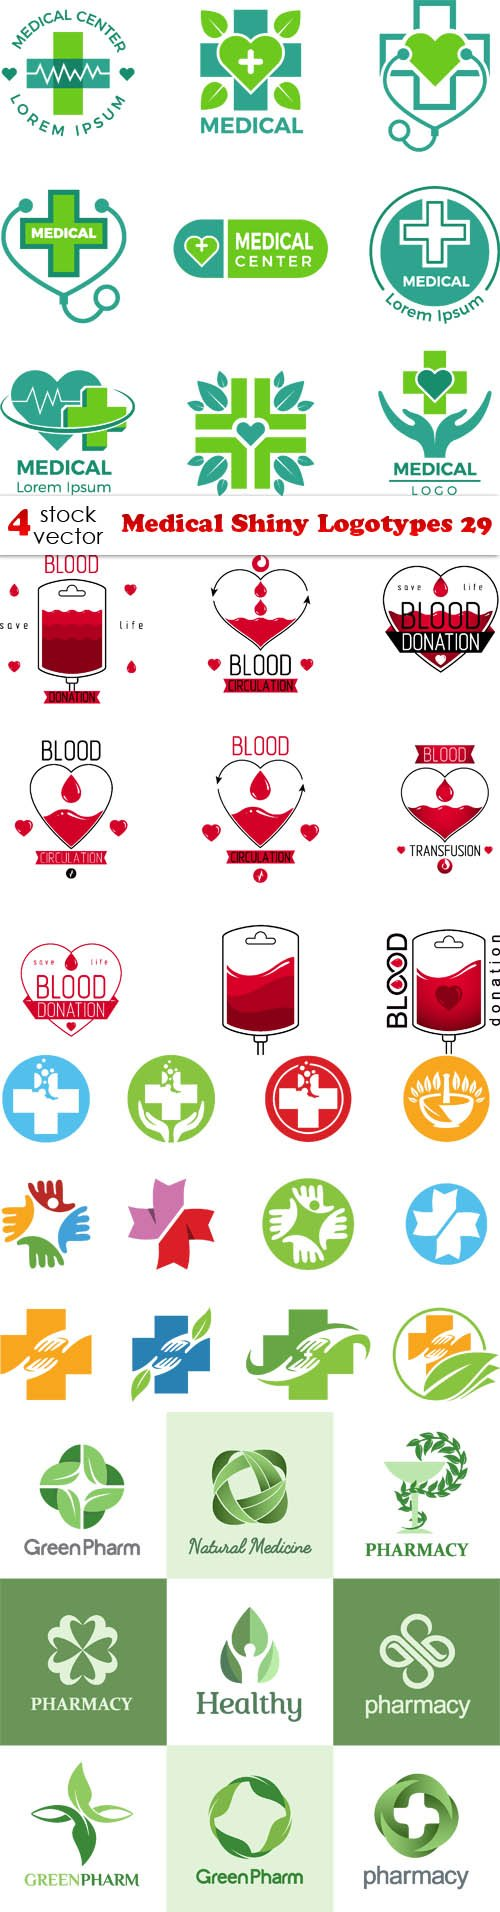 Vectors - Medical Shiny Logotypes 29